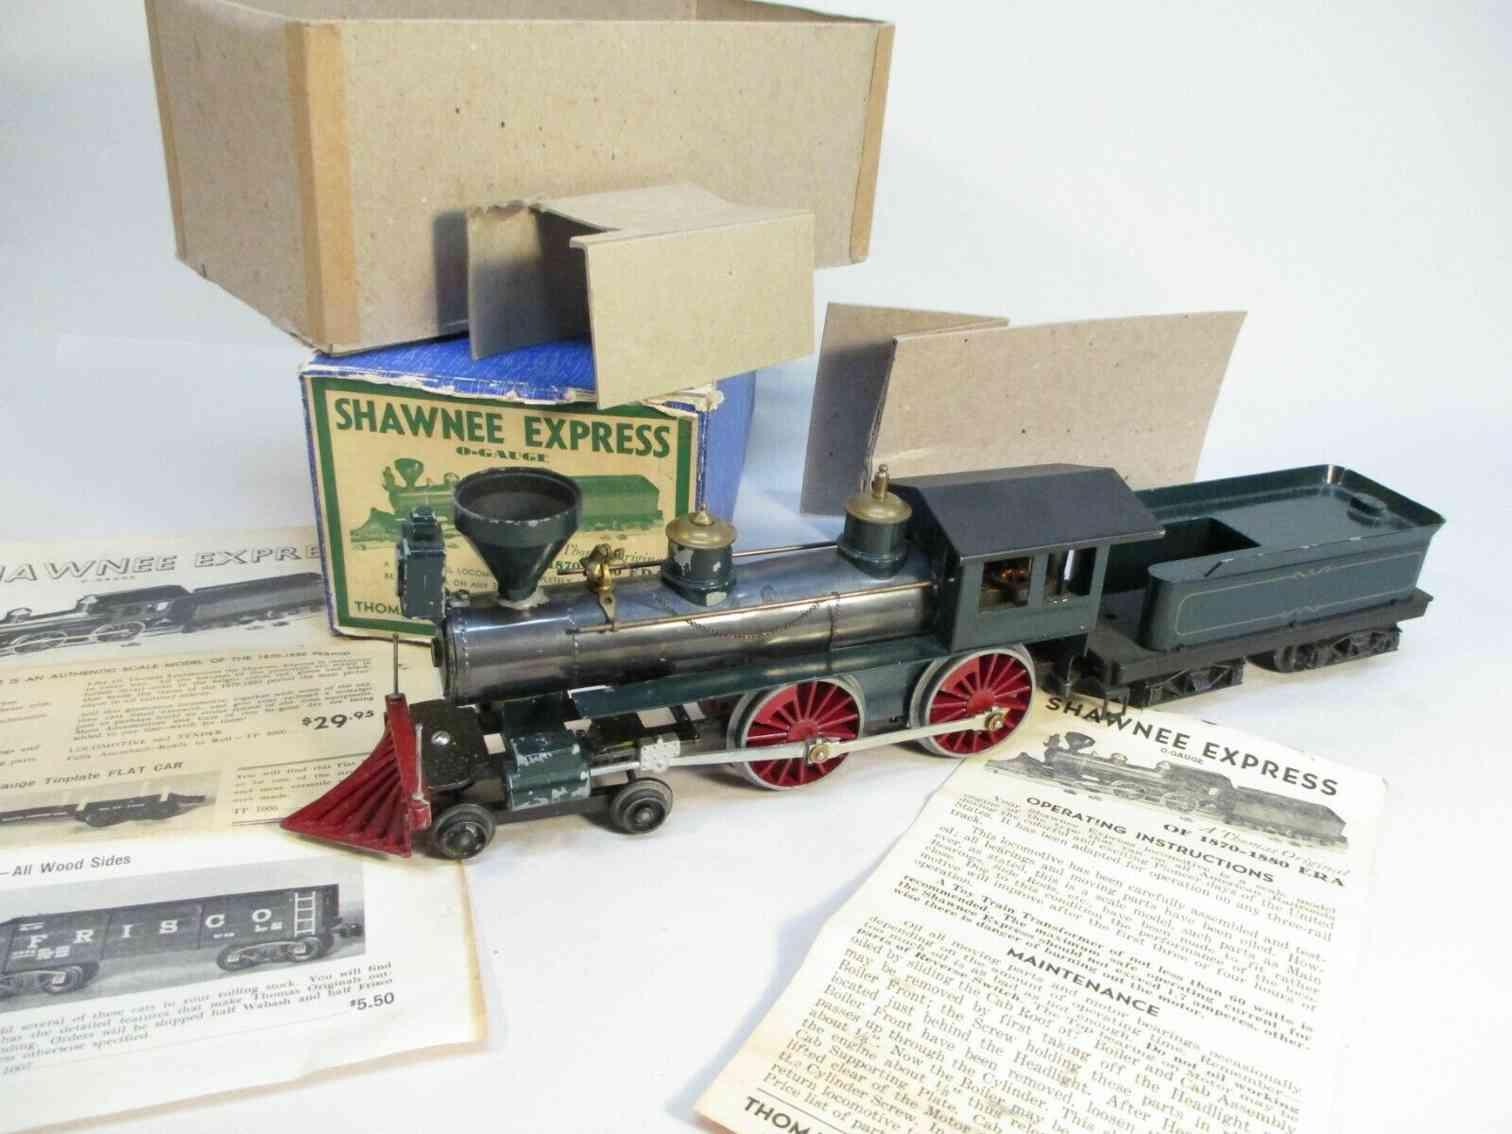 thomas industries railway toy engine shawnee express locomotive tender gauge 0